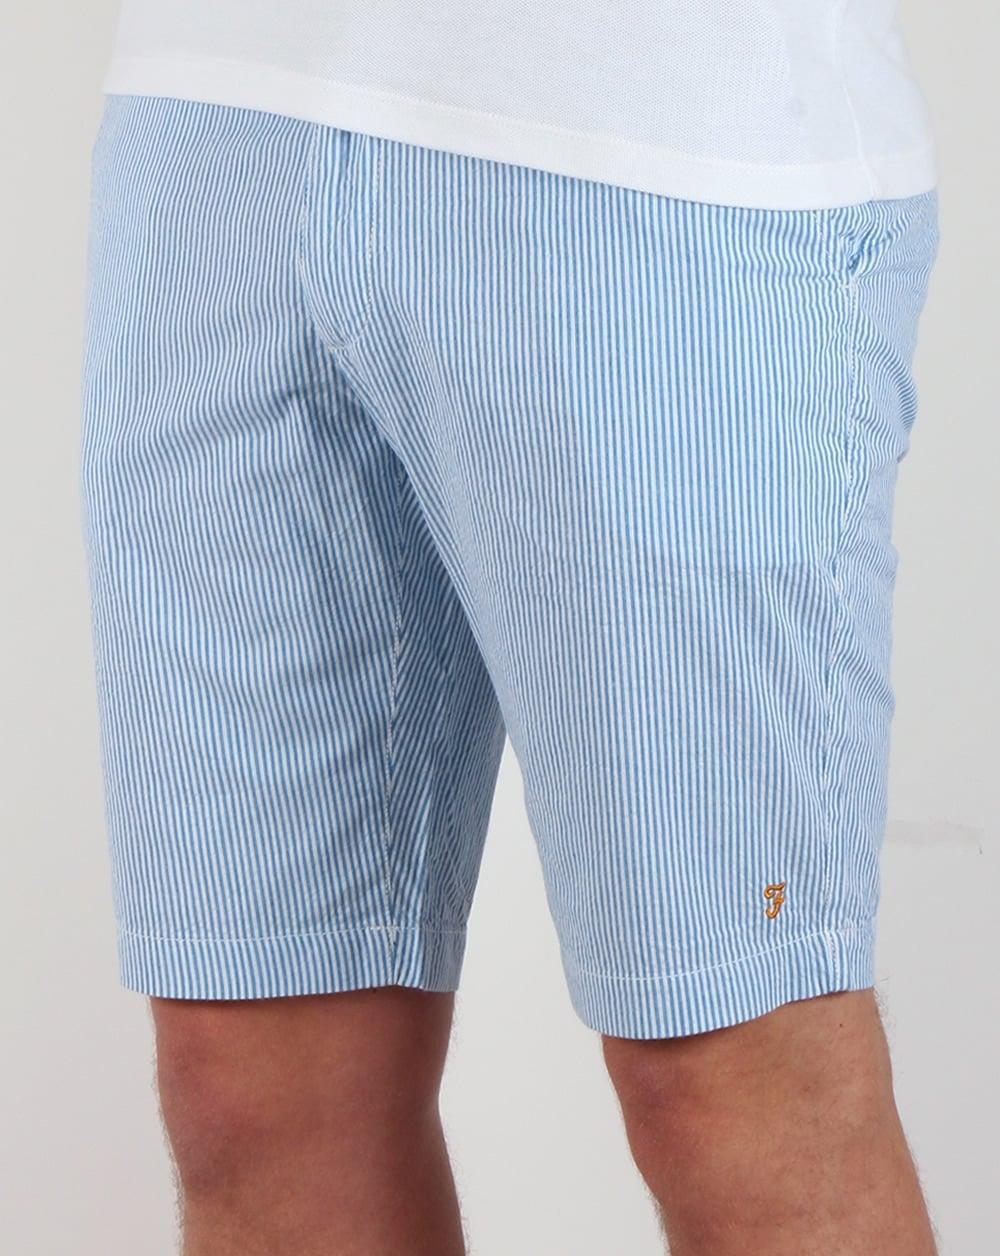 Farah Hawking Stripe Shorts White/Blue,mens,summer,knee length